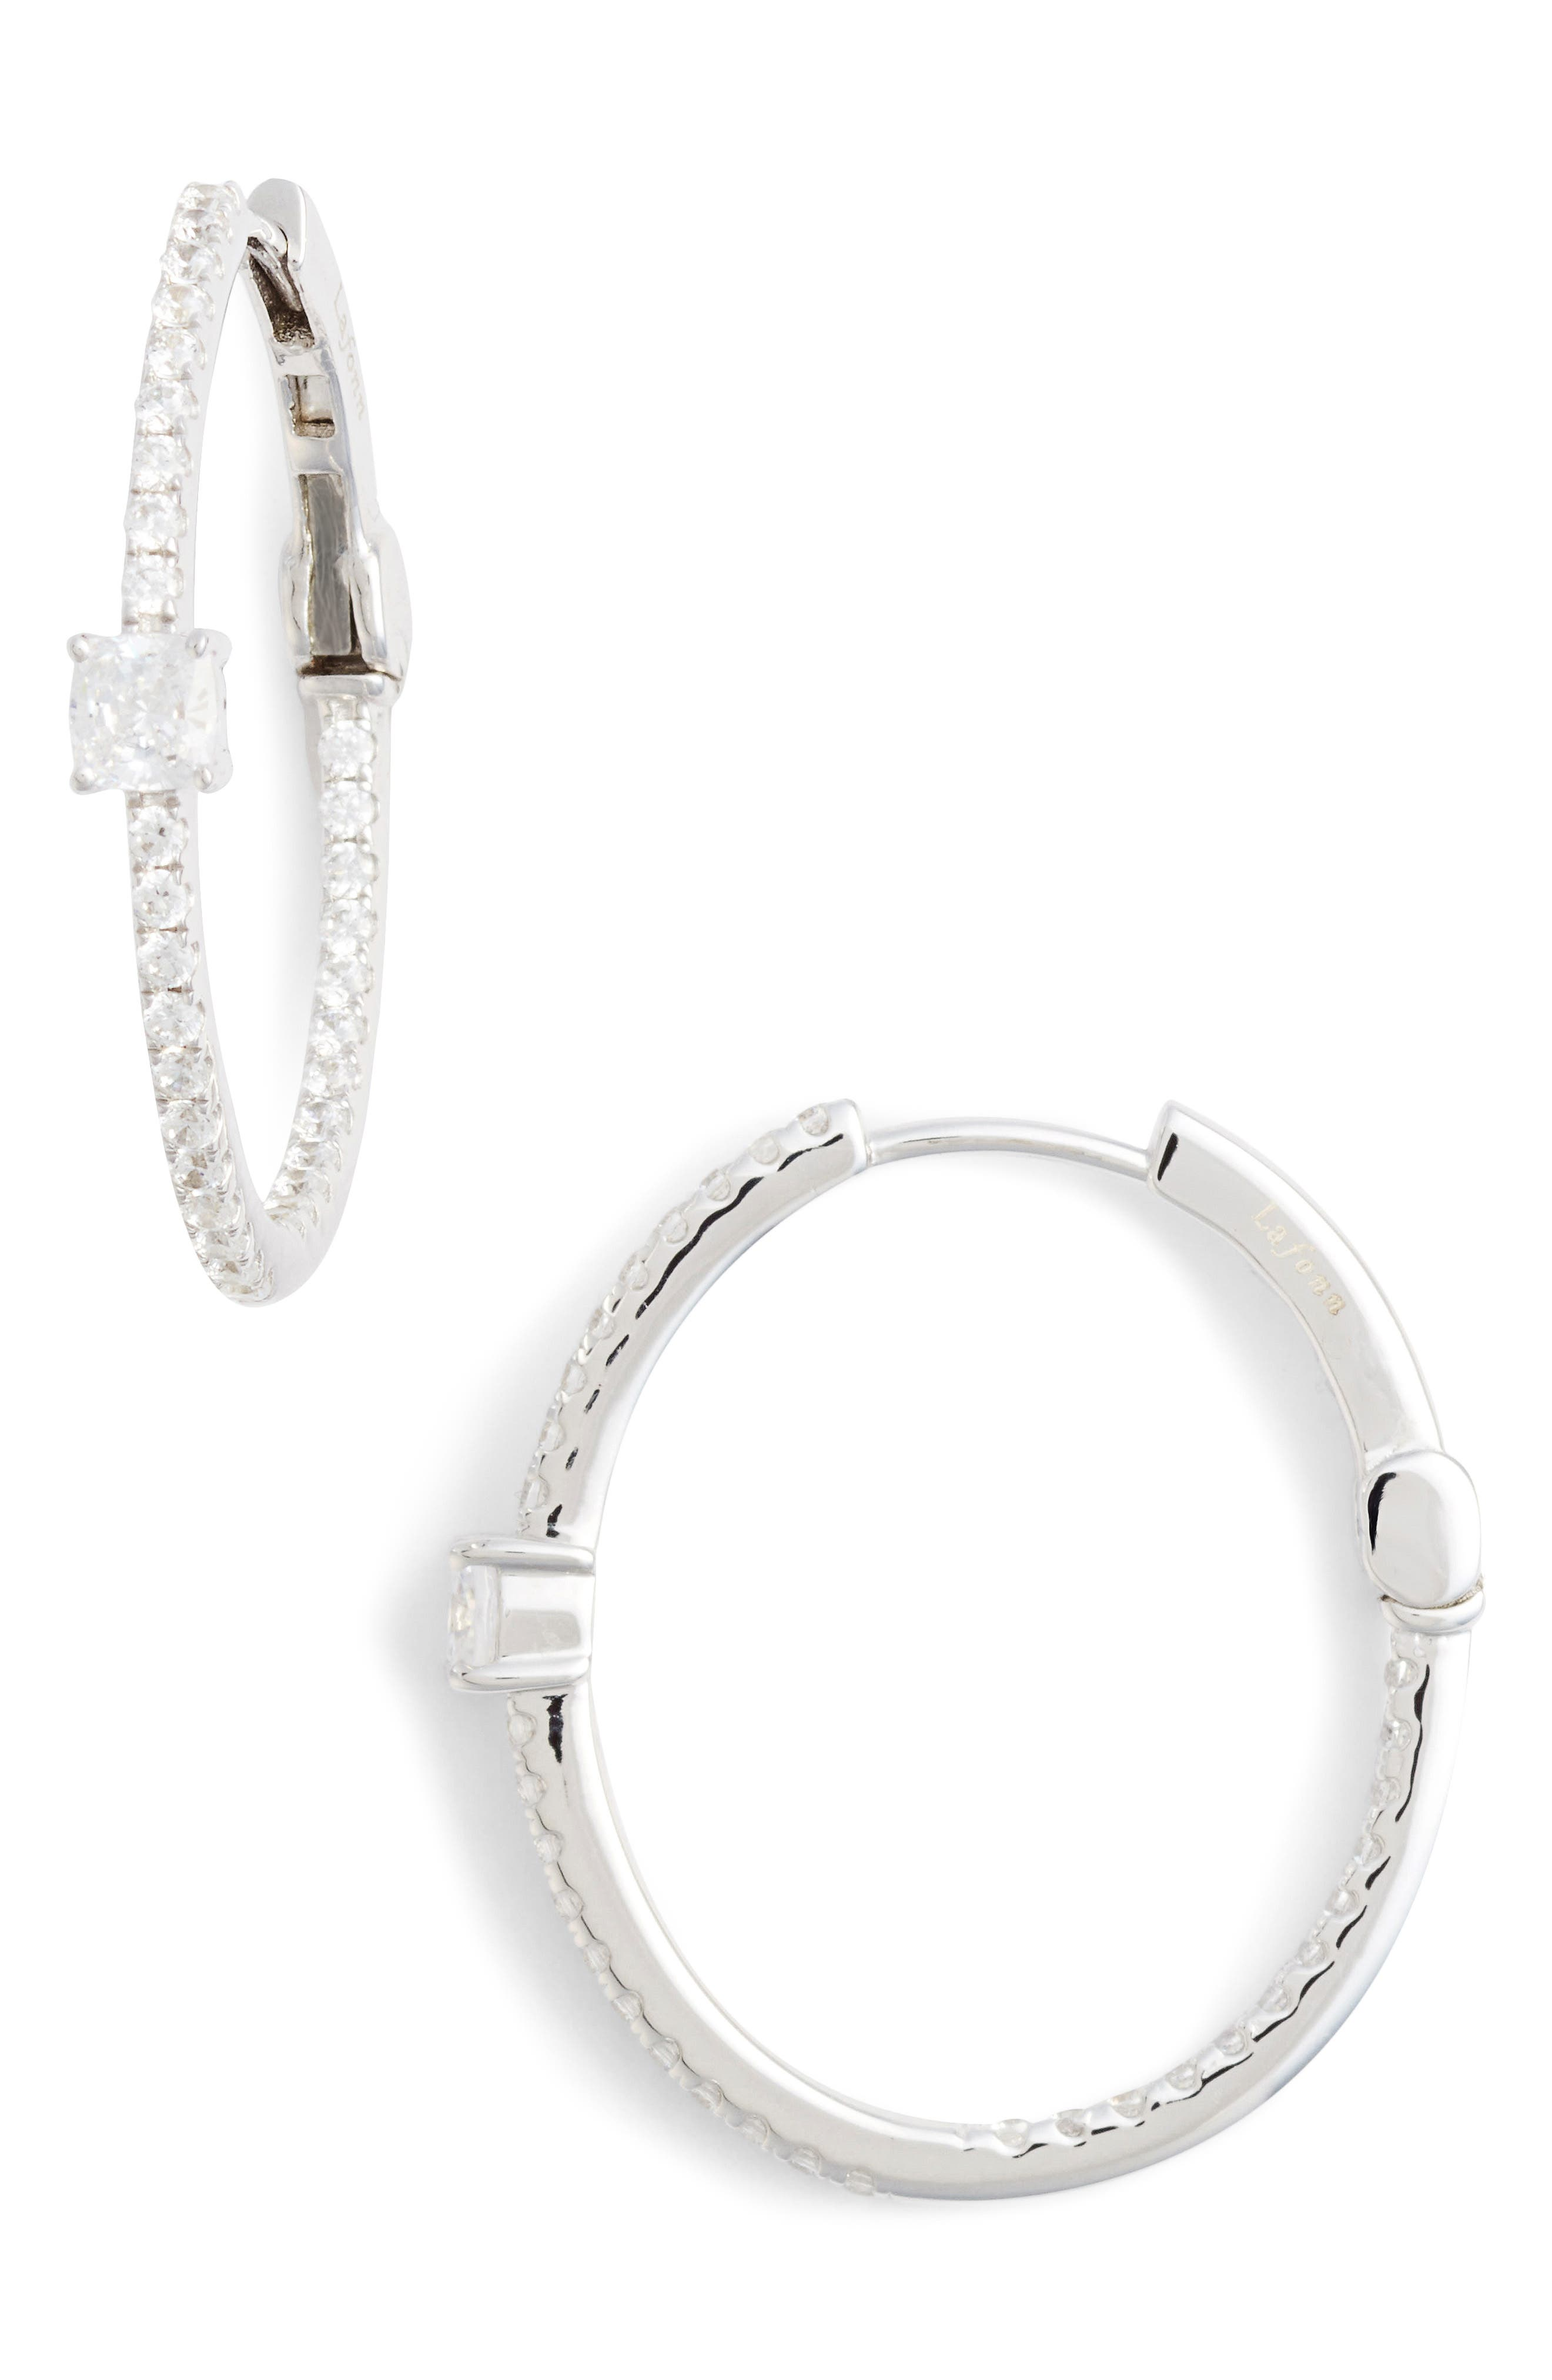 Simulated Diamond Hoop Earrings,                         Main,                         color, SILVER/ CLEAR